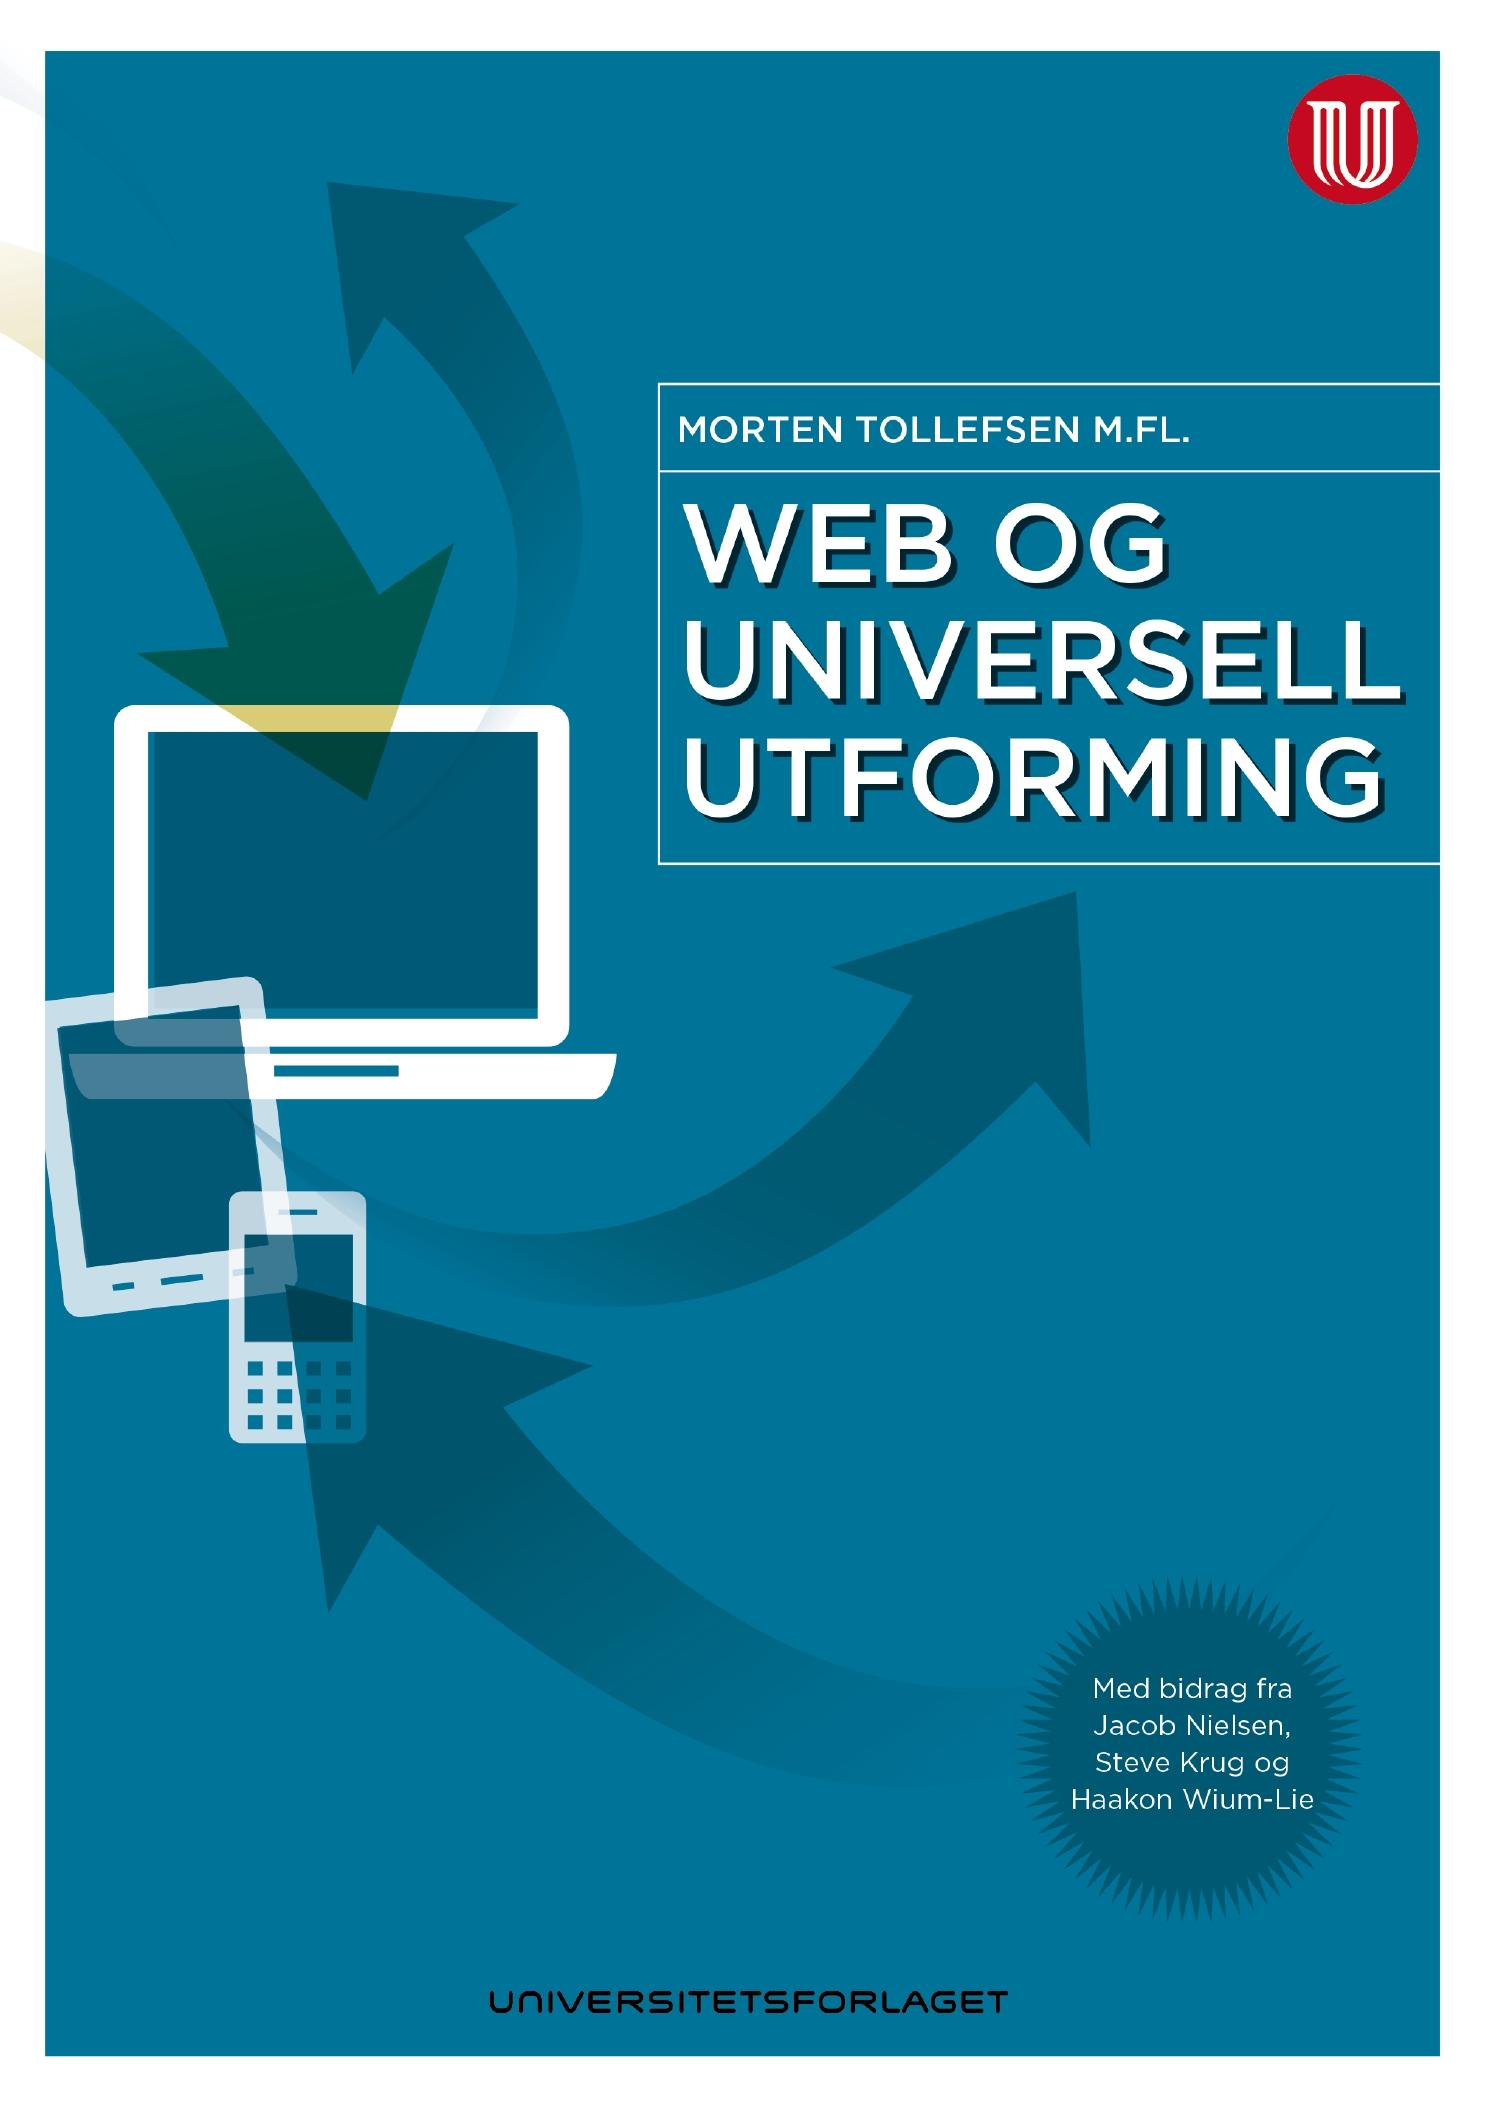 Wcag universell utforming